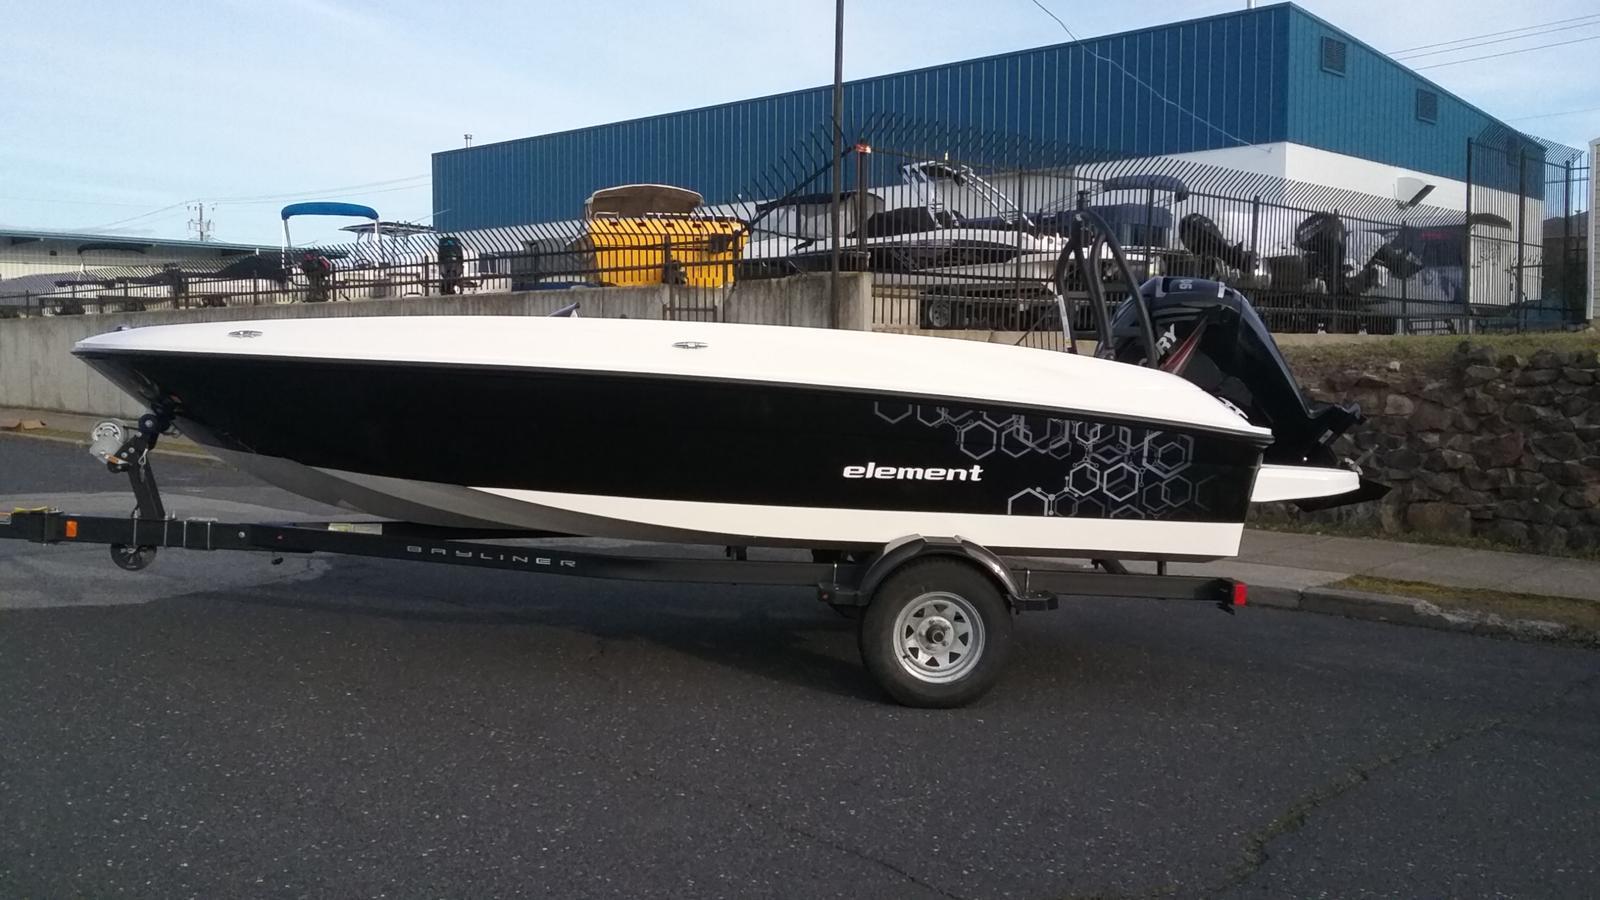 For Sale: 2018 Bayliner Element E18 19ft<br/>Trudeau's Sea Ray - Spokane